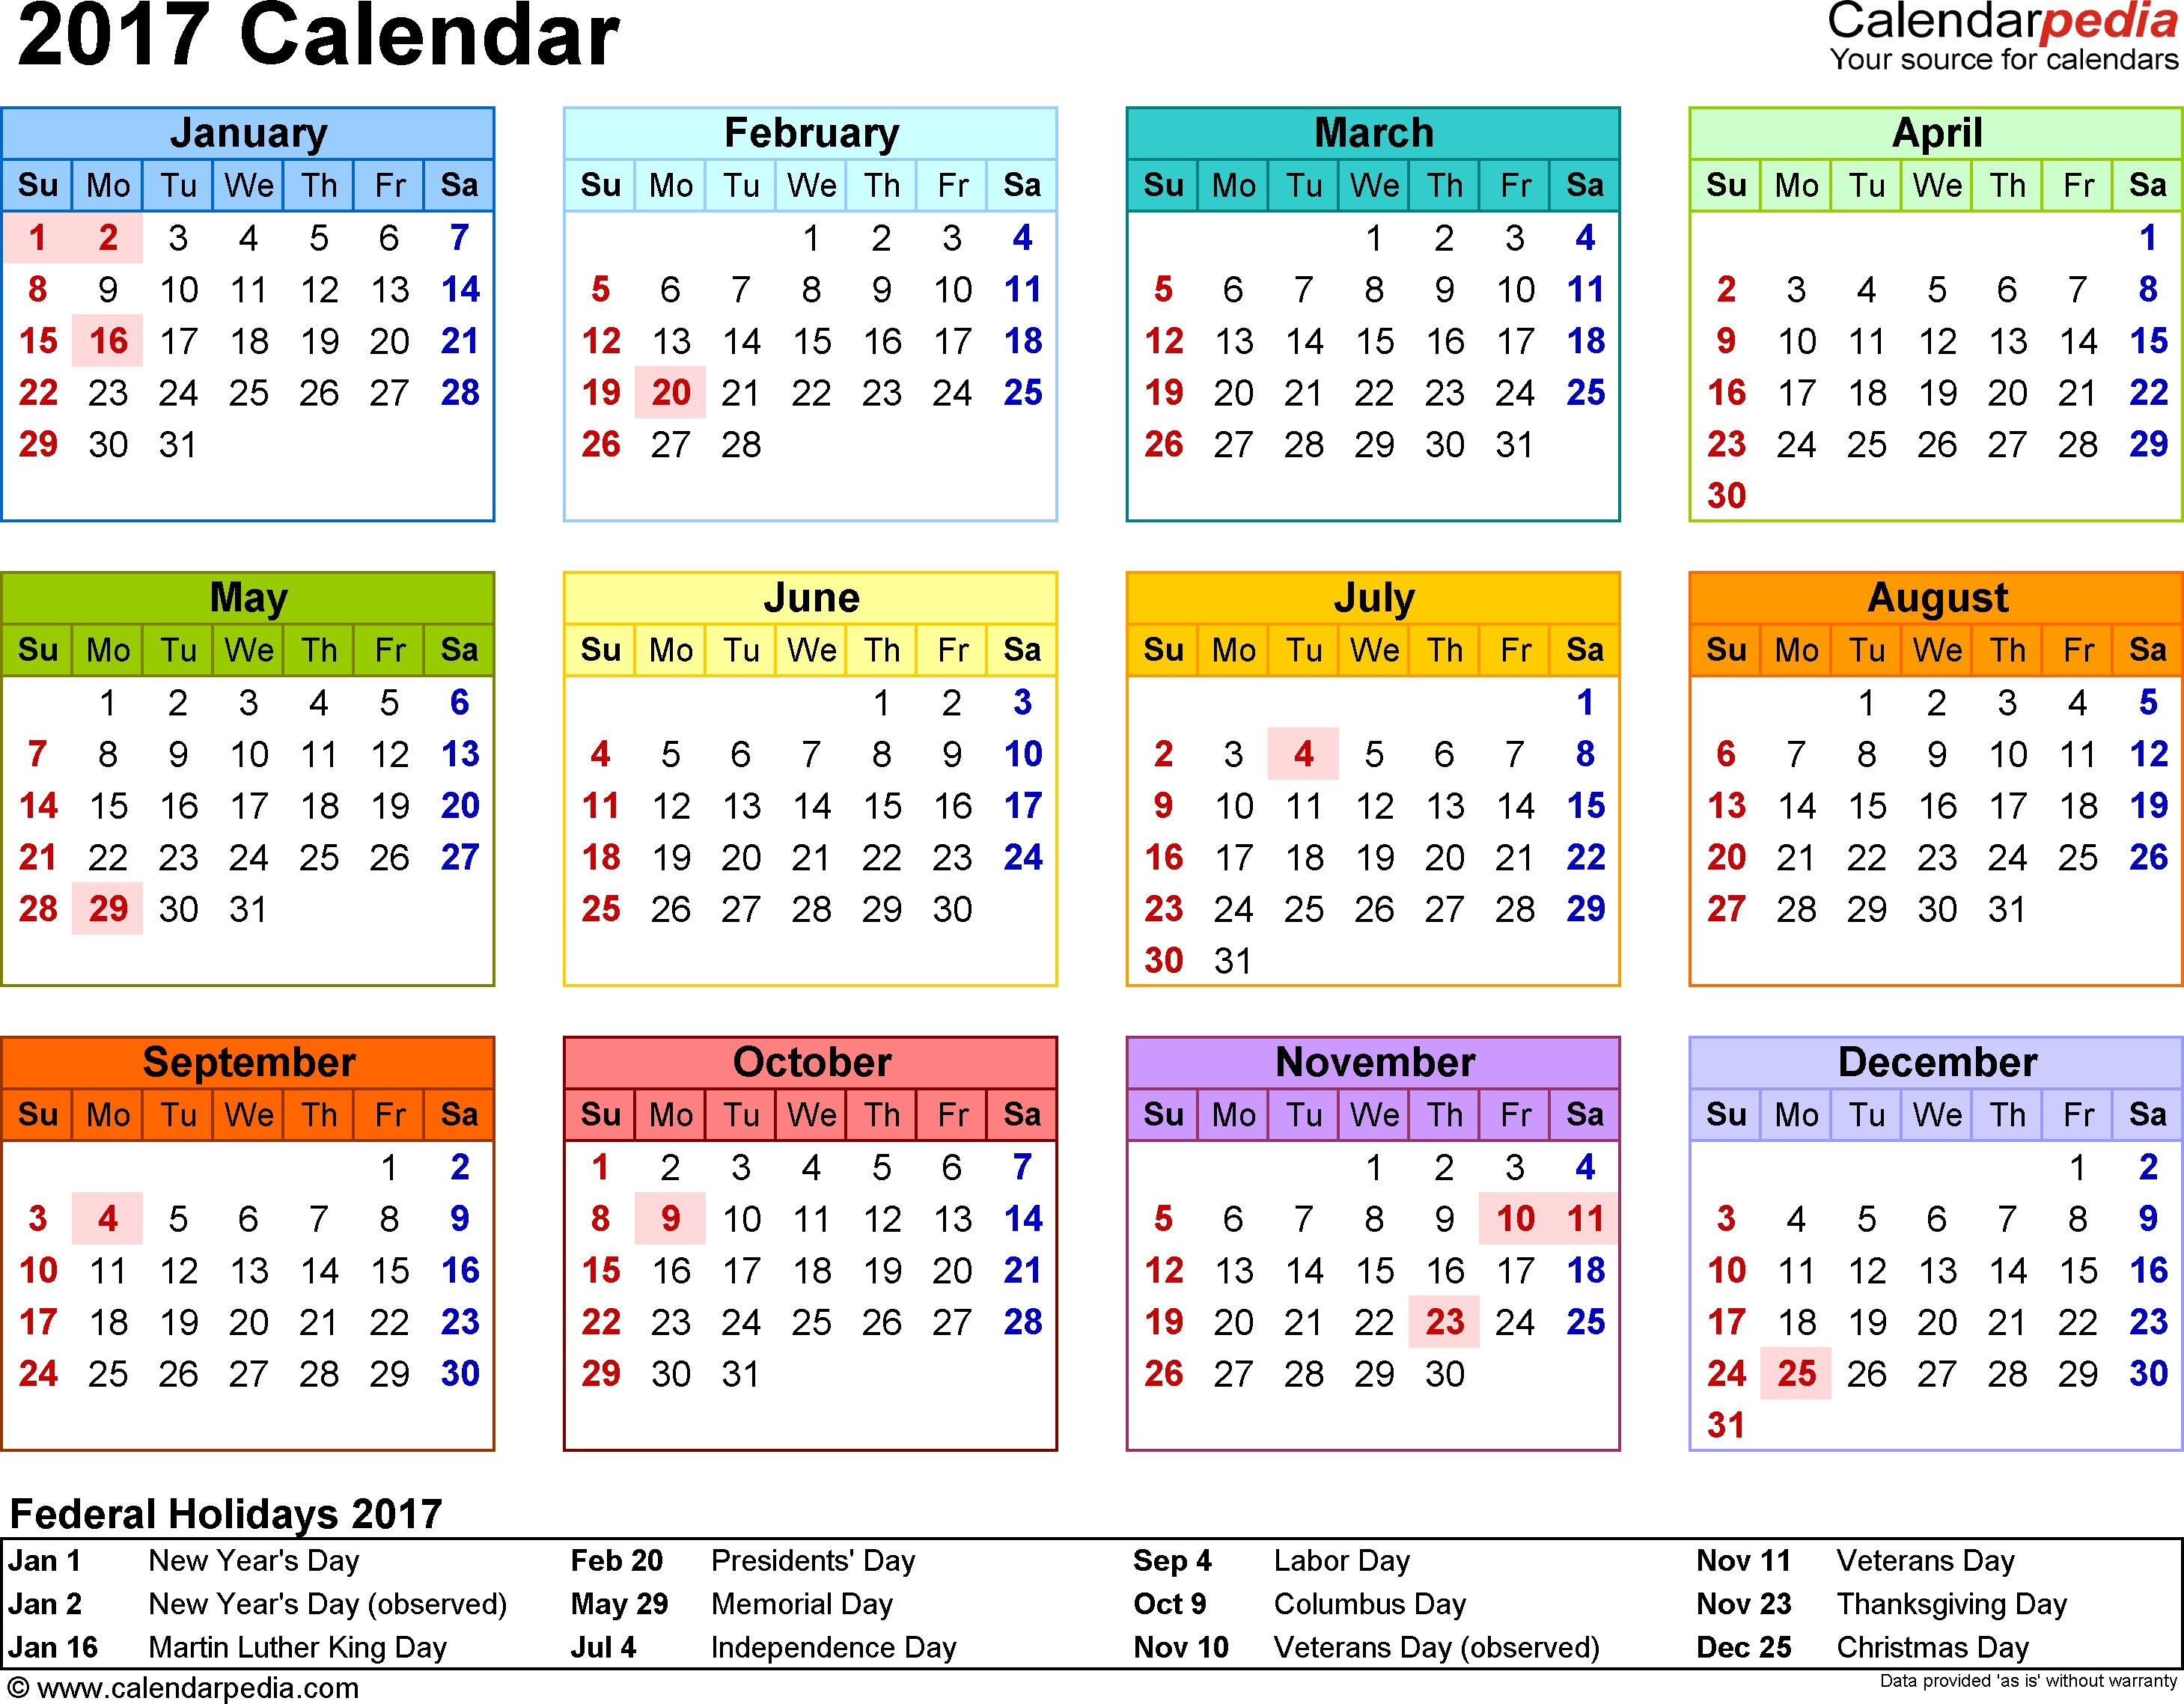 Get A Wall Calendar And Thrive | Caterina Rando regarding 2012 Calendar Sri Lanka With All Holidays